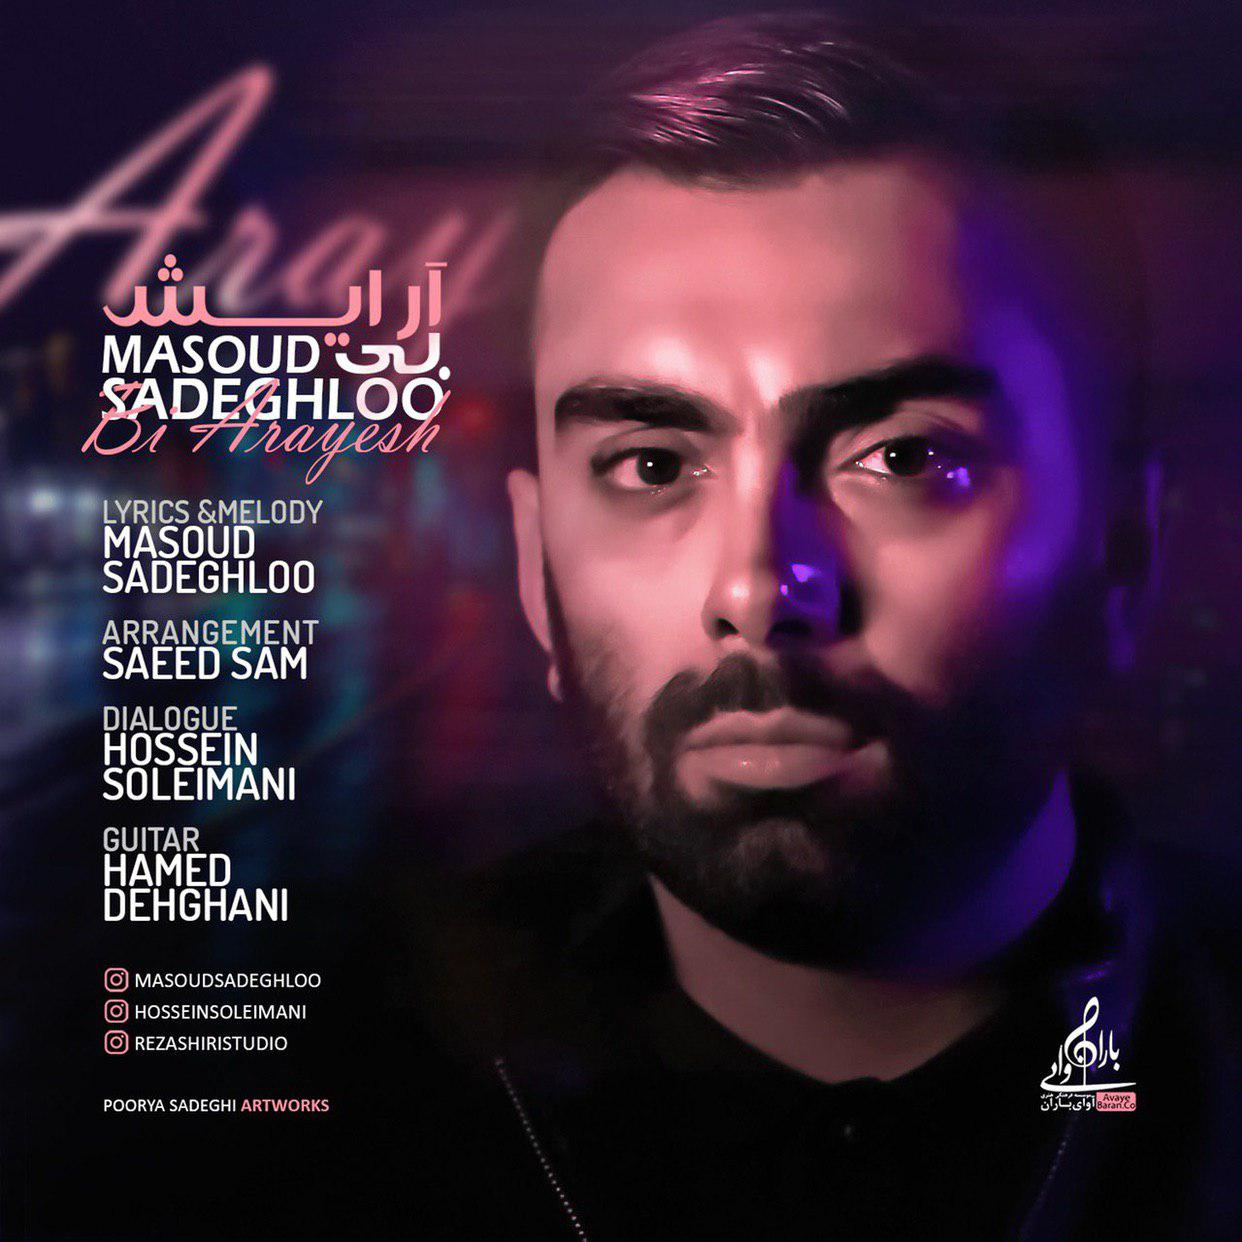 Masoud Sadeghloo - Bi Arayesh - دانلود آهنگ مسعود صادقلو به نام بی آرایش